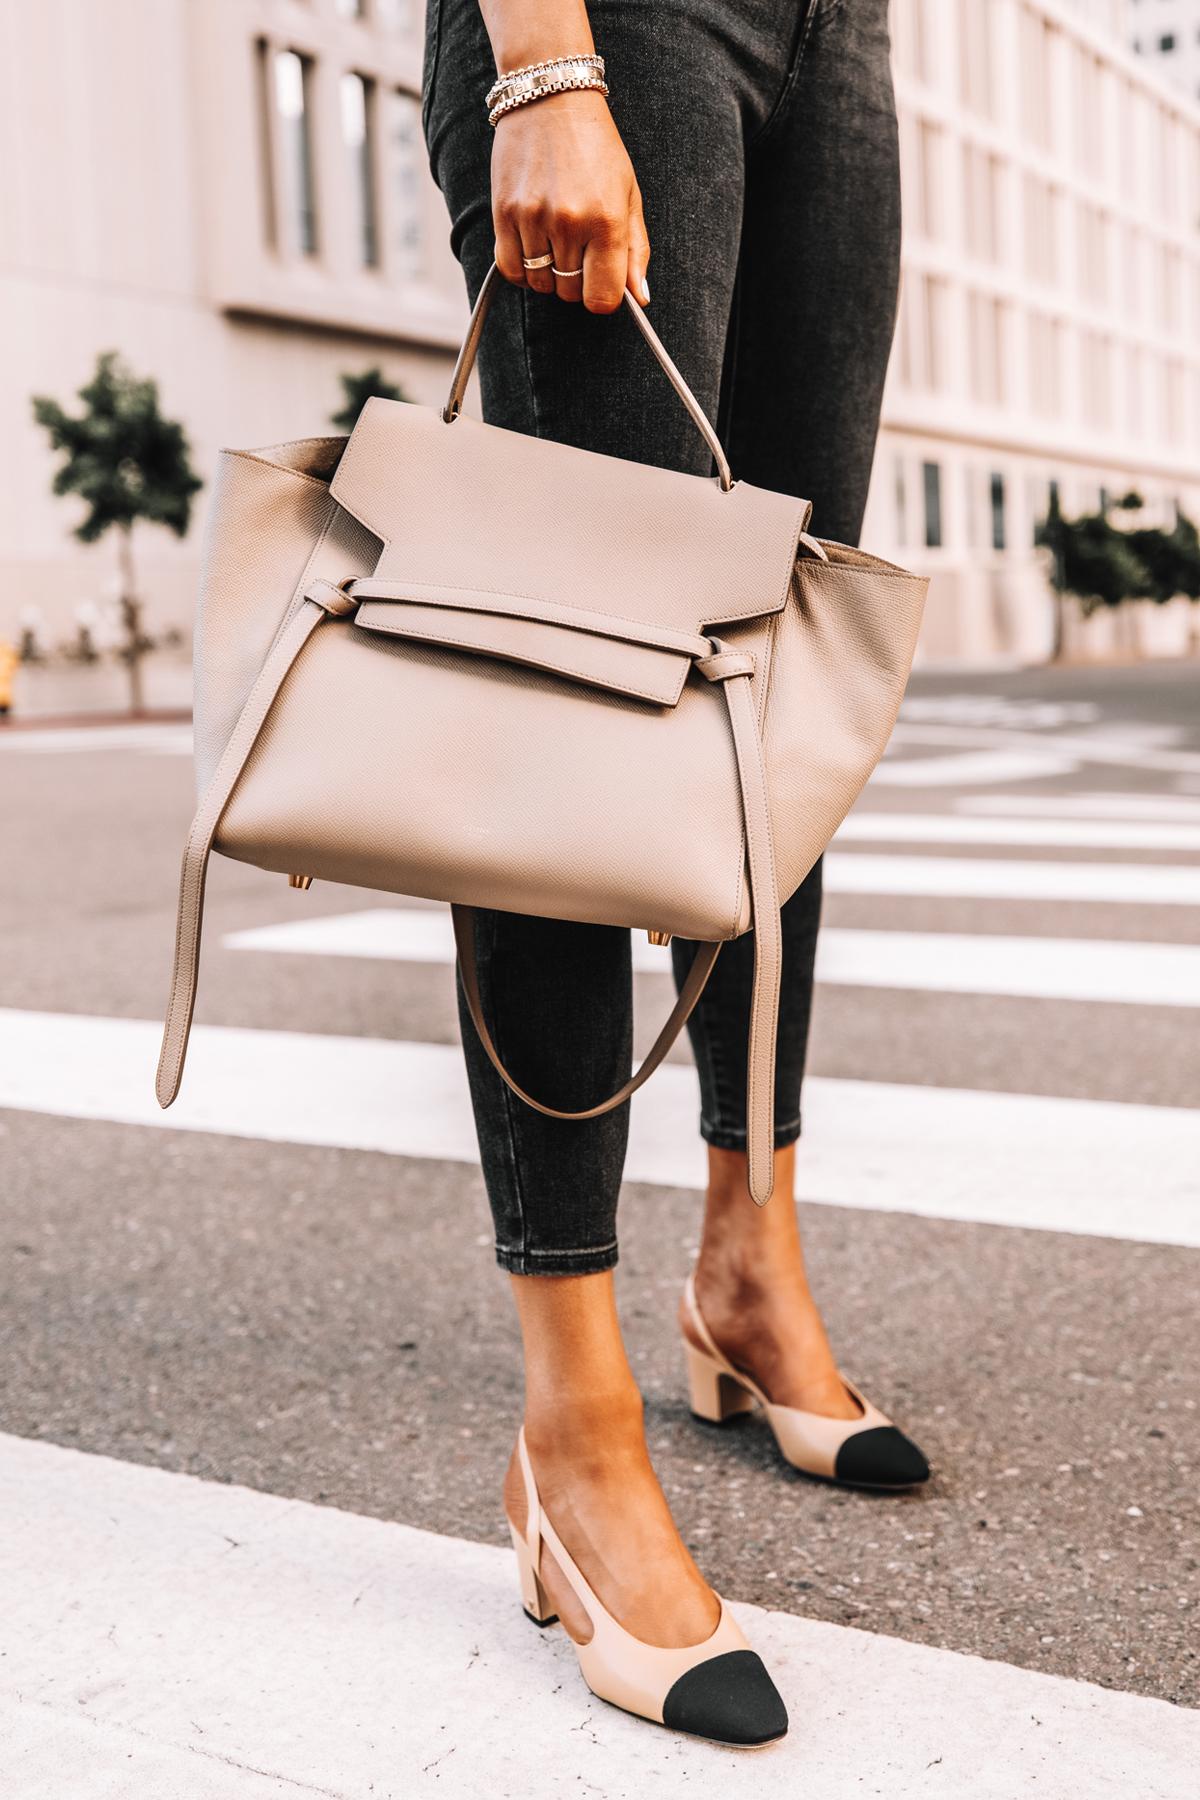 Fashion Jackson Celine Mini Belt Bag Review 1